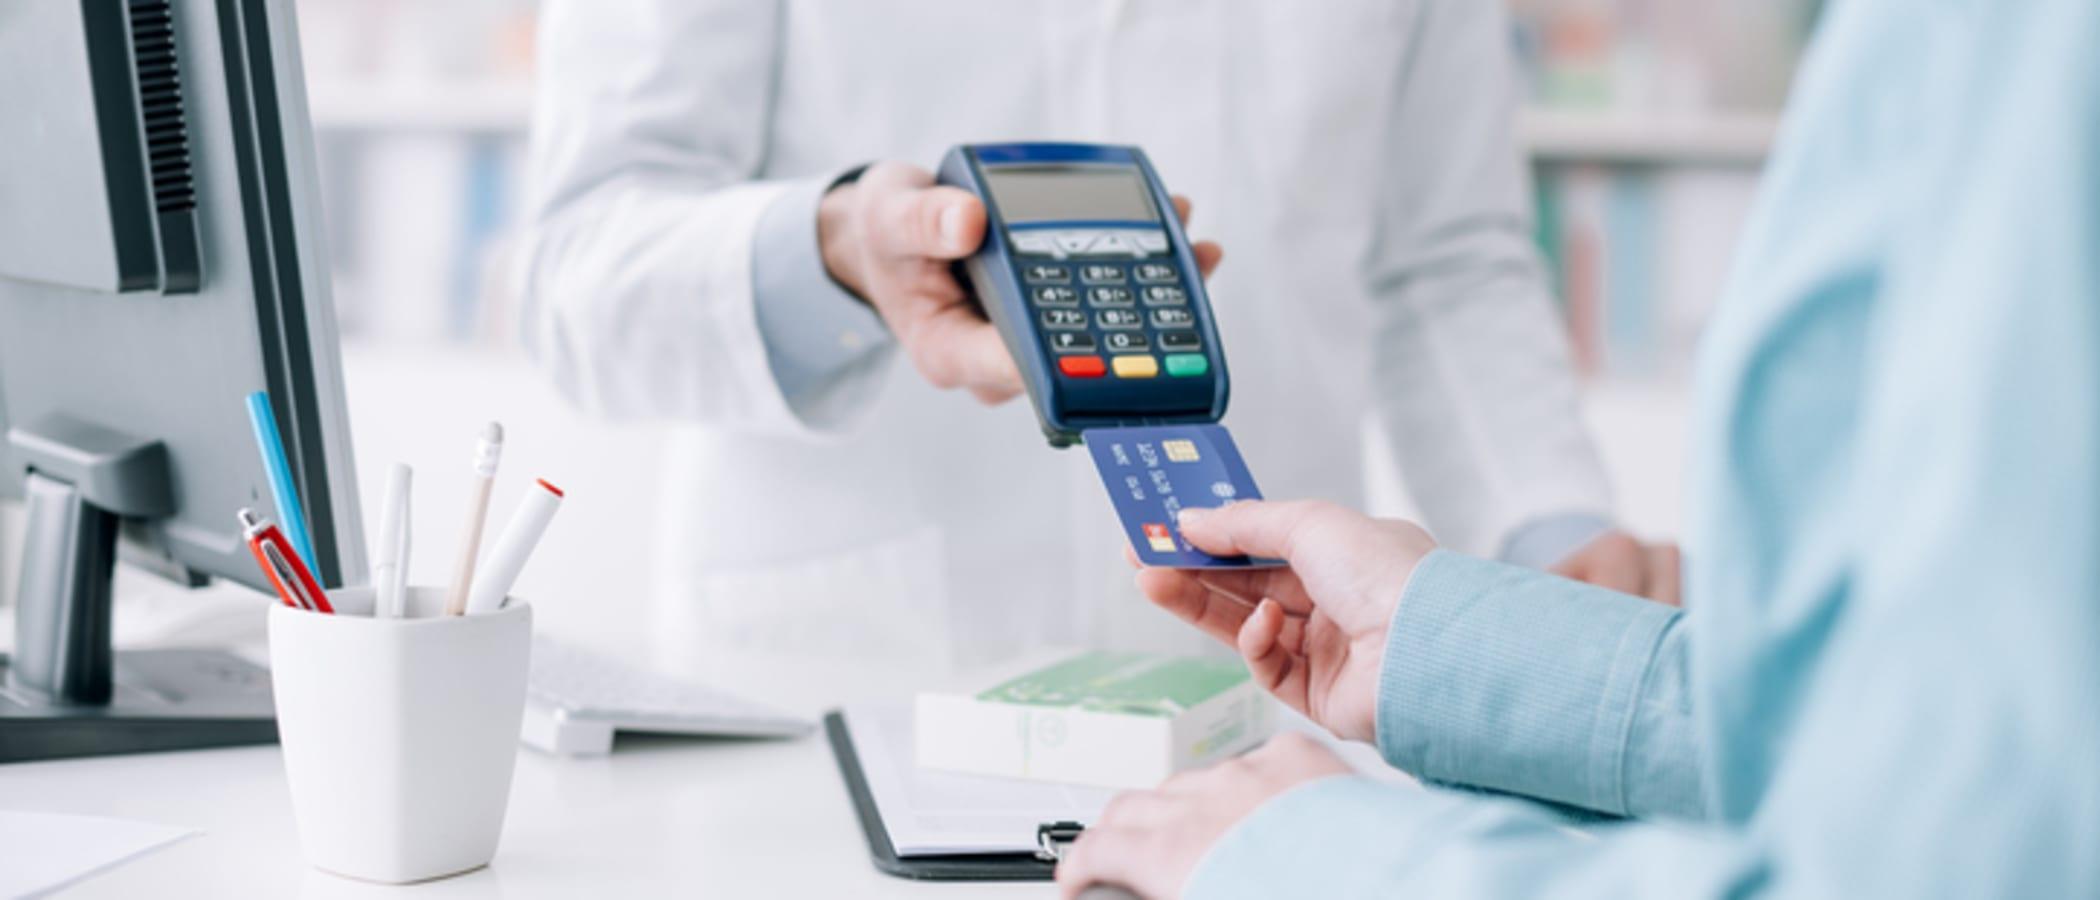 2018 FSA Contribution Cap Rises to $2,650